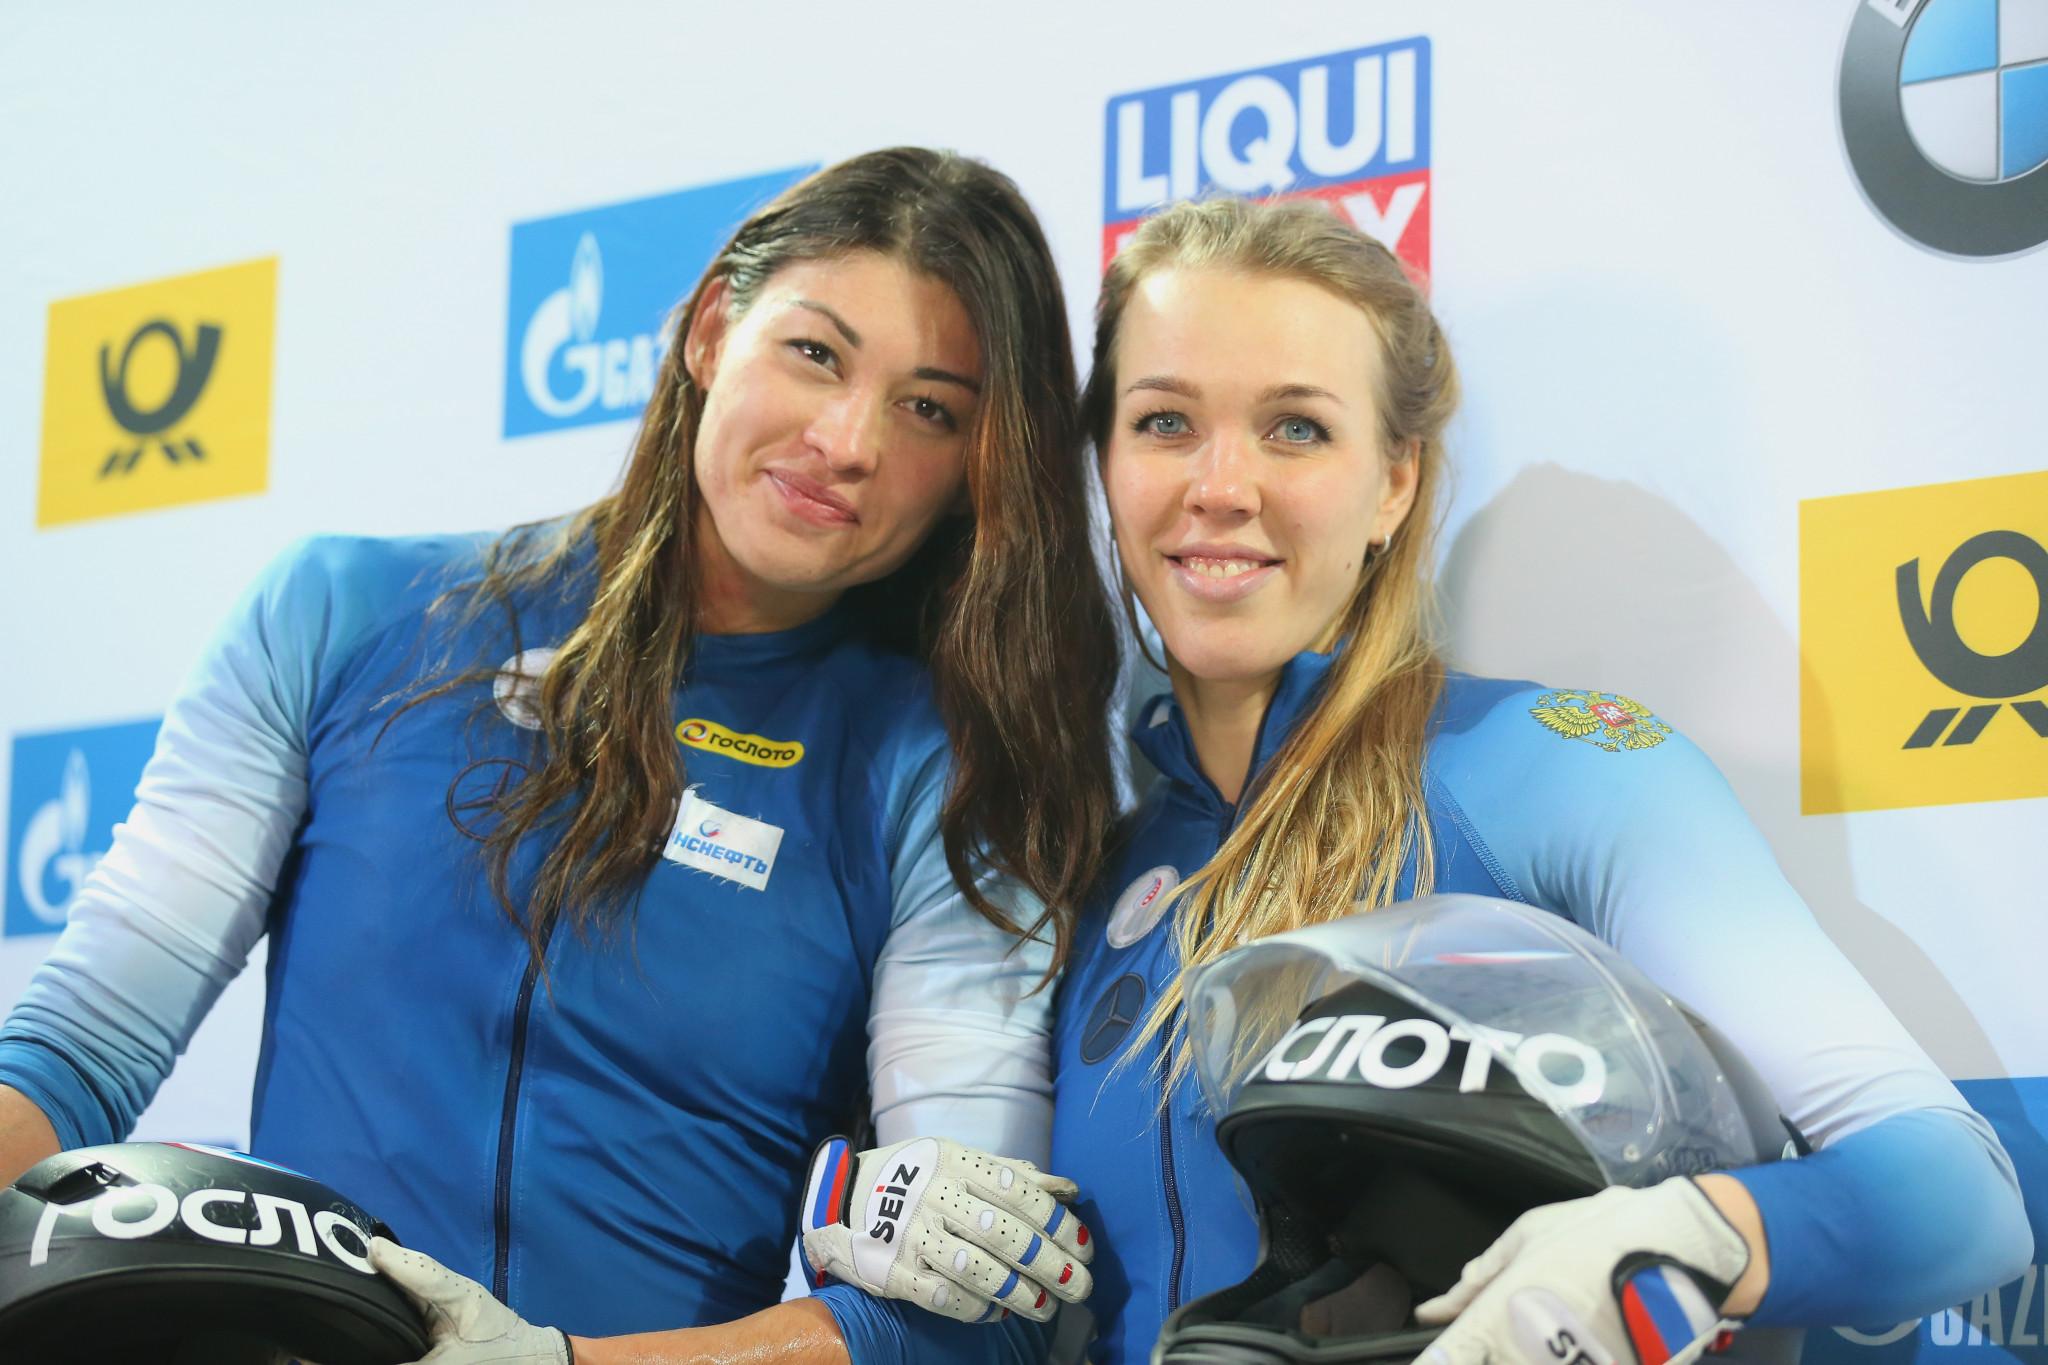 Nadezhda Sergeeva, right, failed a test at Pyeongchang 2018 ©Getty Images